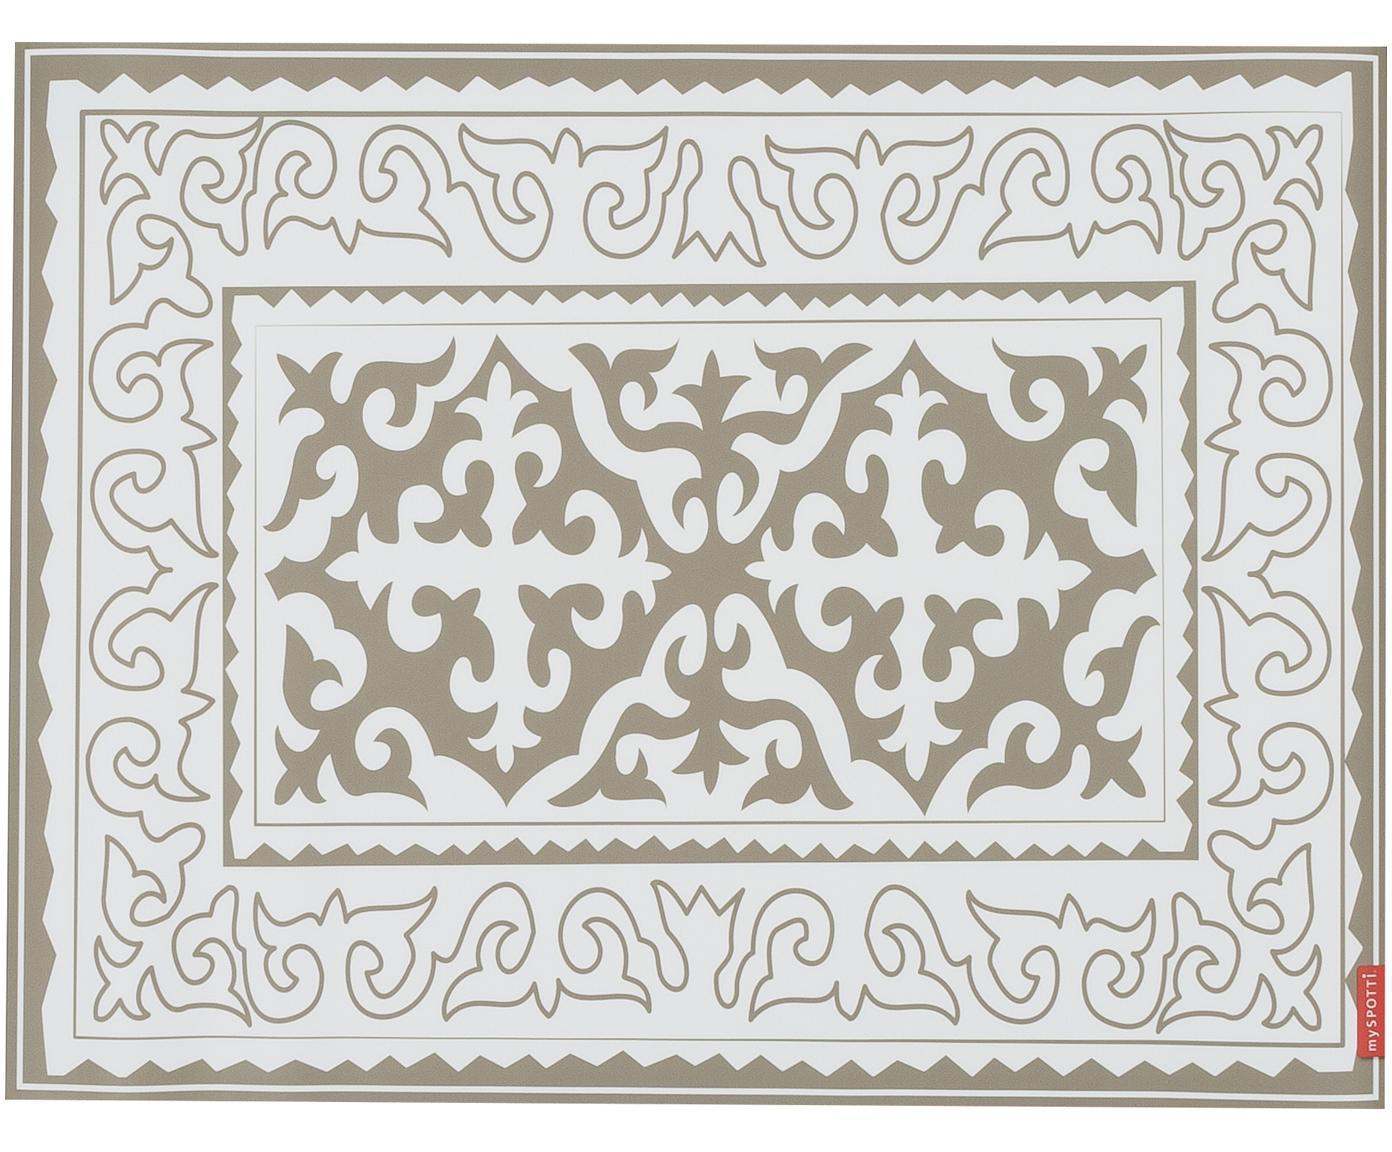 Vinyl-Bodenmatte Aksana, Vinyl, Weiß, Taupe, 65 x 85 cm